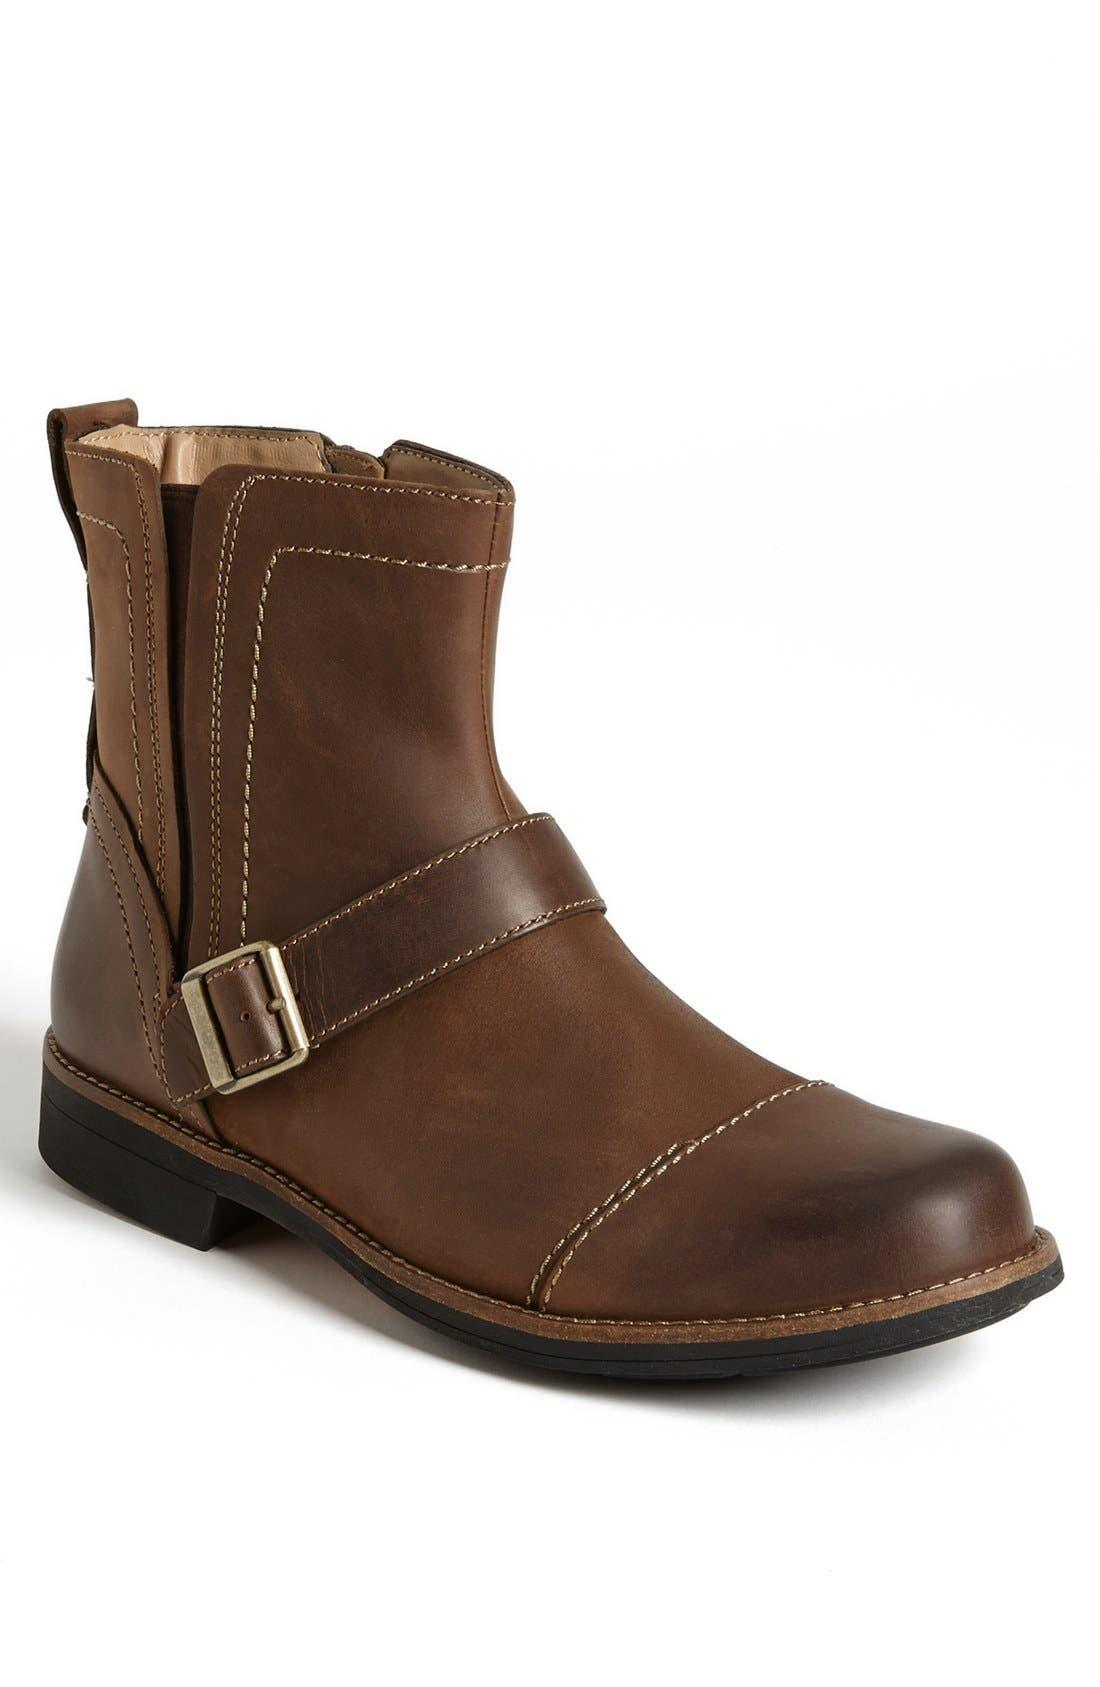 Main Image - Clarks® 'Meldon Strap' Zip Boot